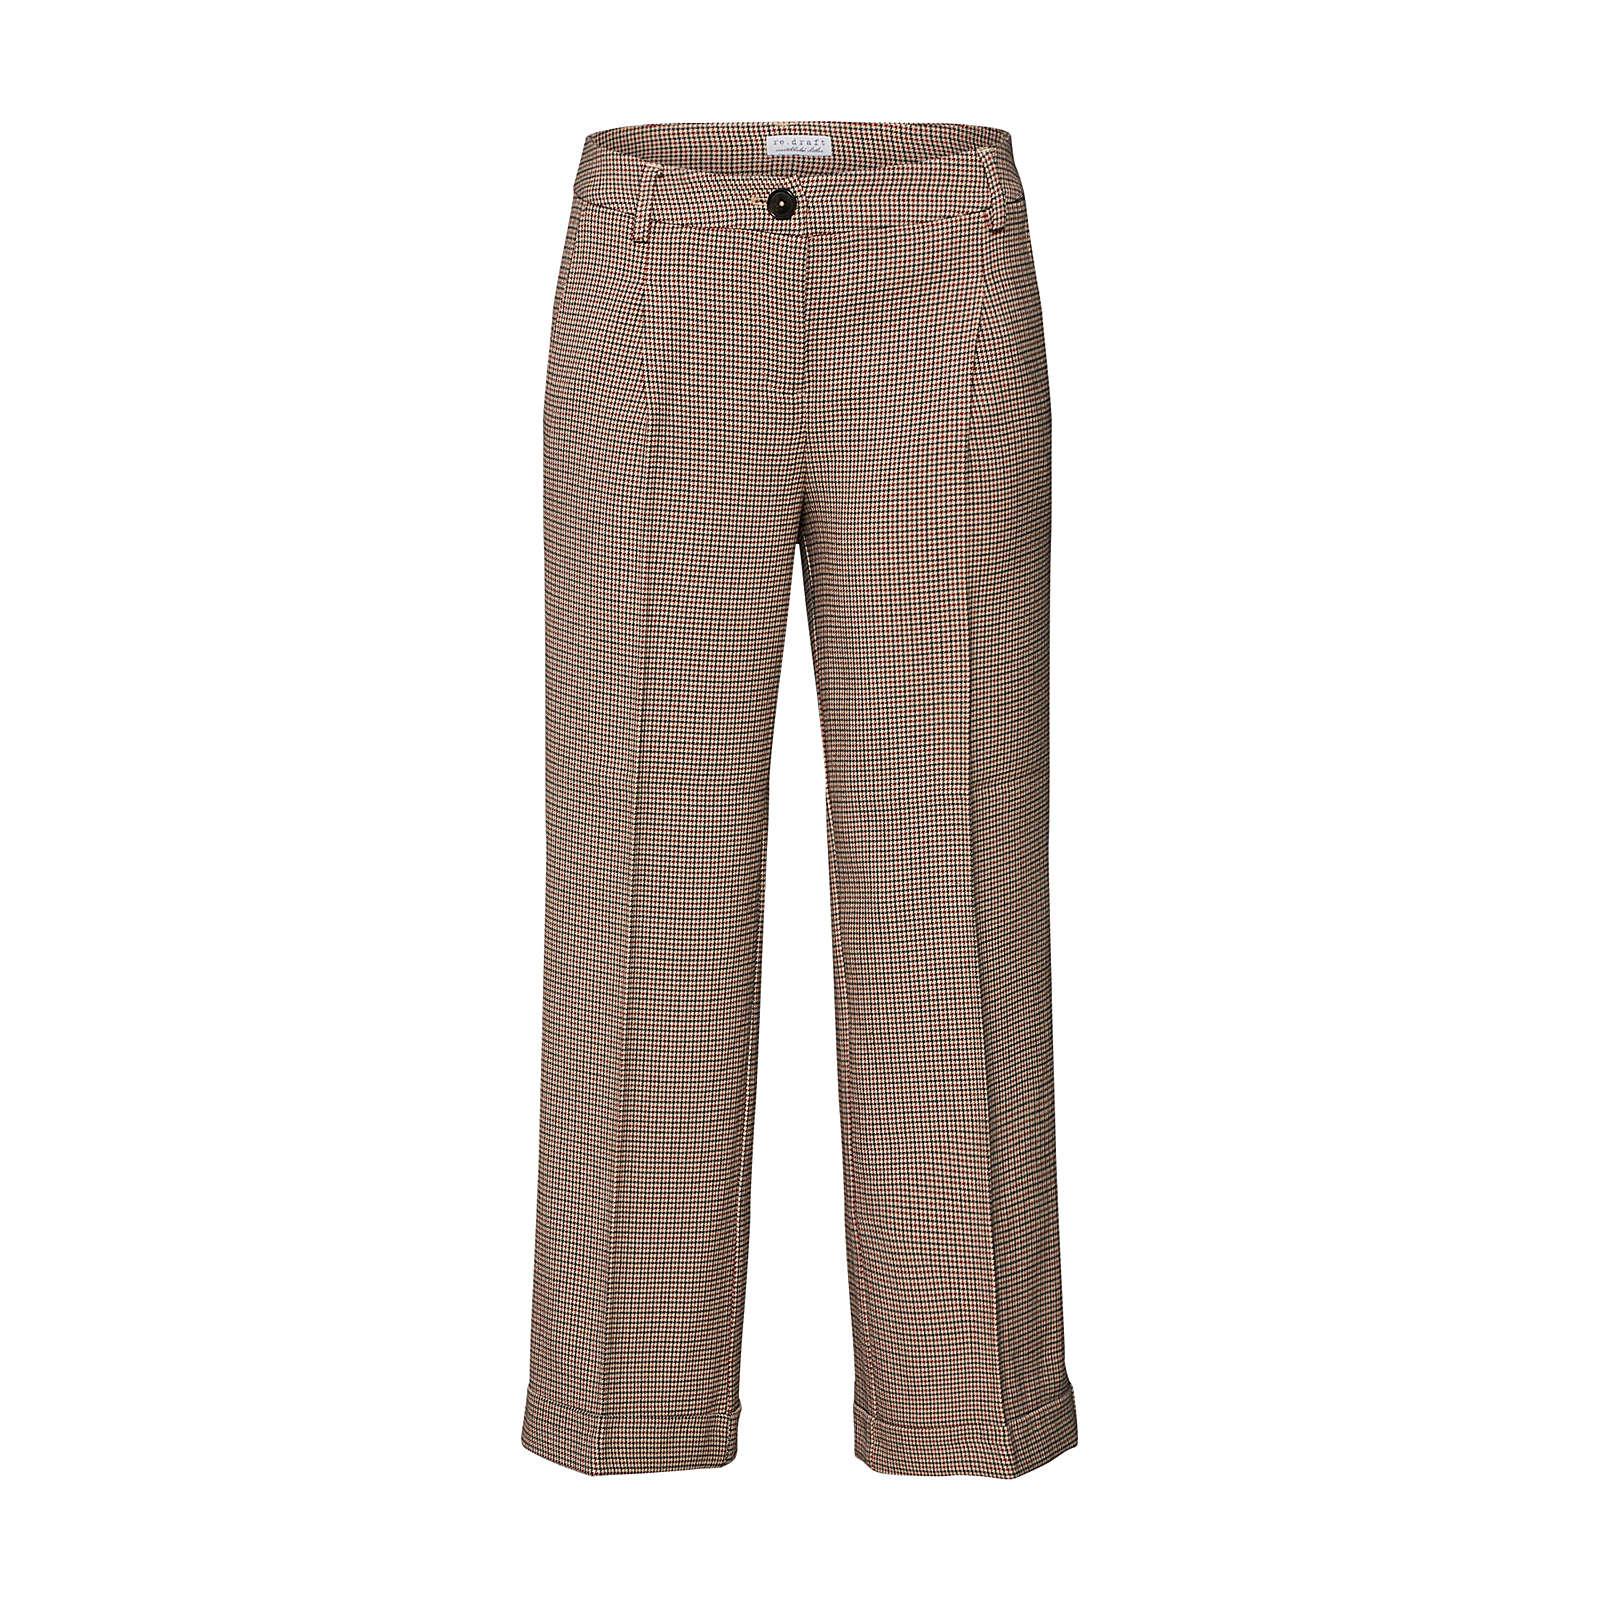 re.draft Bügelfaltenhose Stoffhosen beige Damen Gr. 38